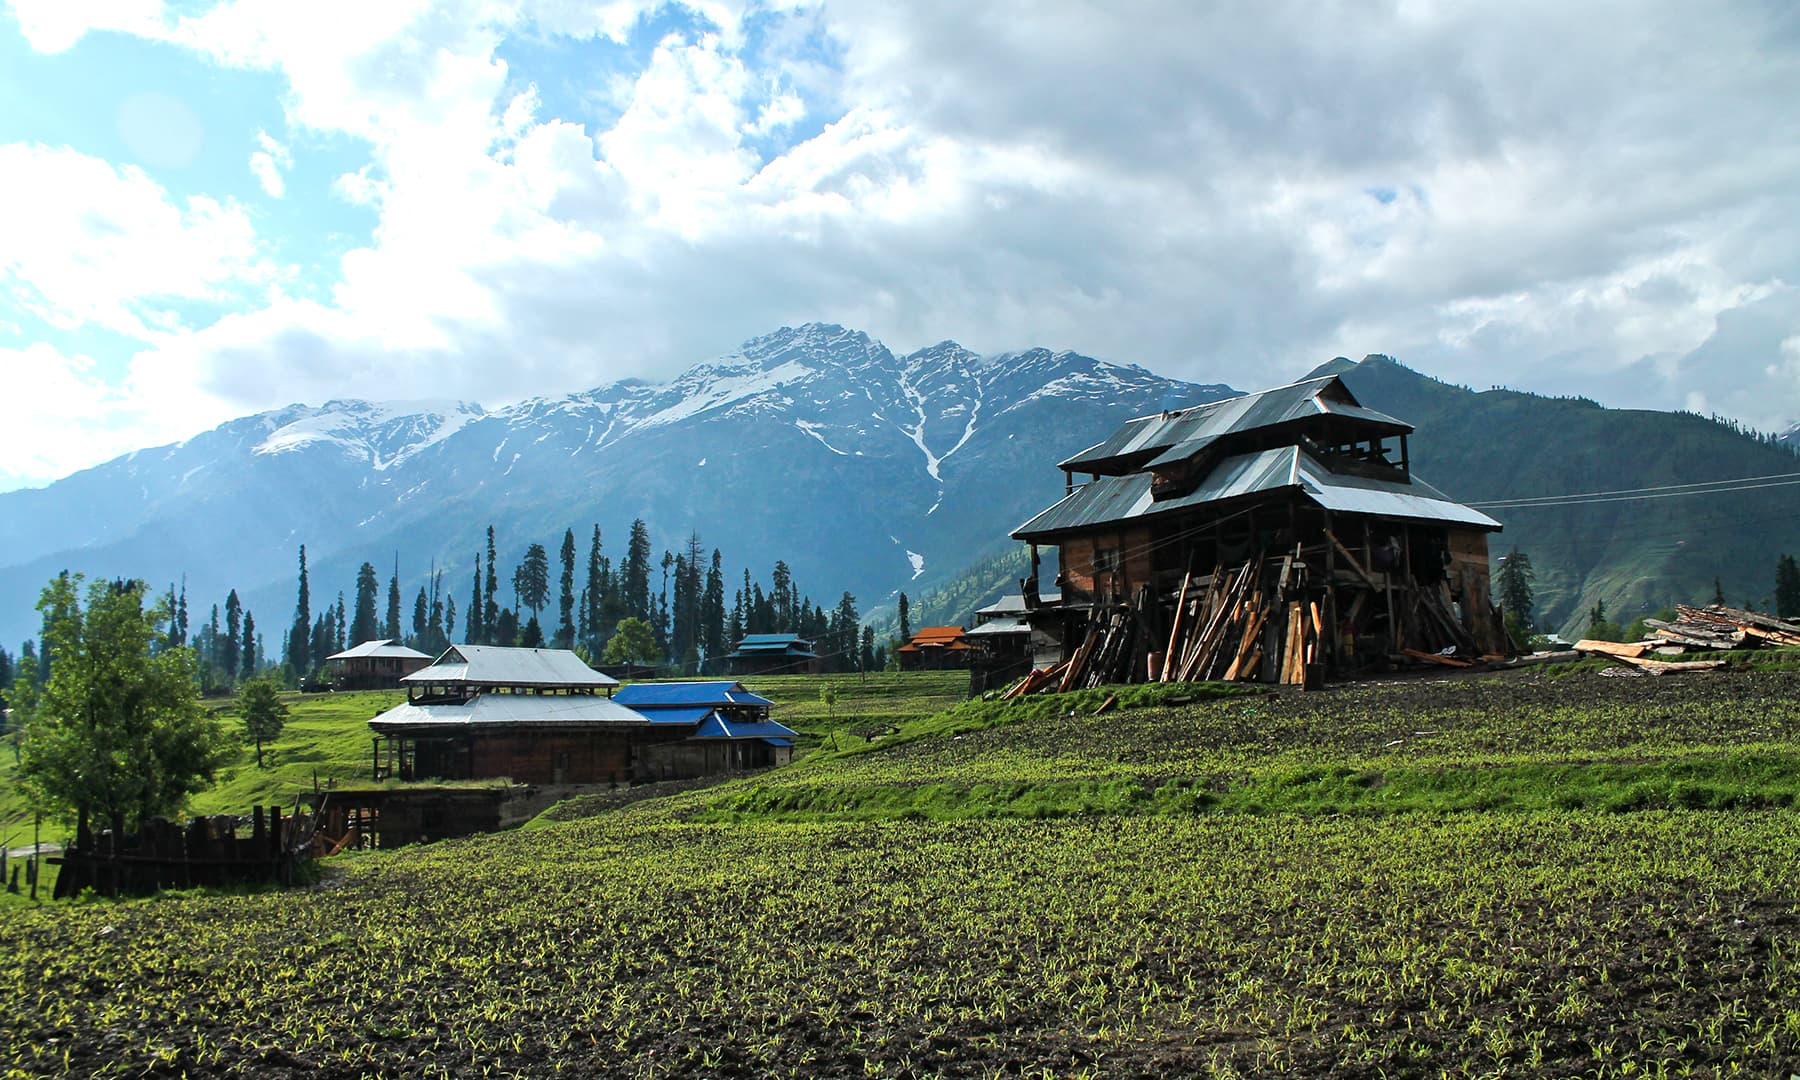 Farmland, houses and mountains. —Asif Mahmood